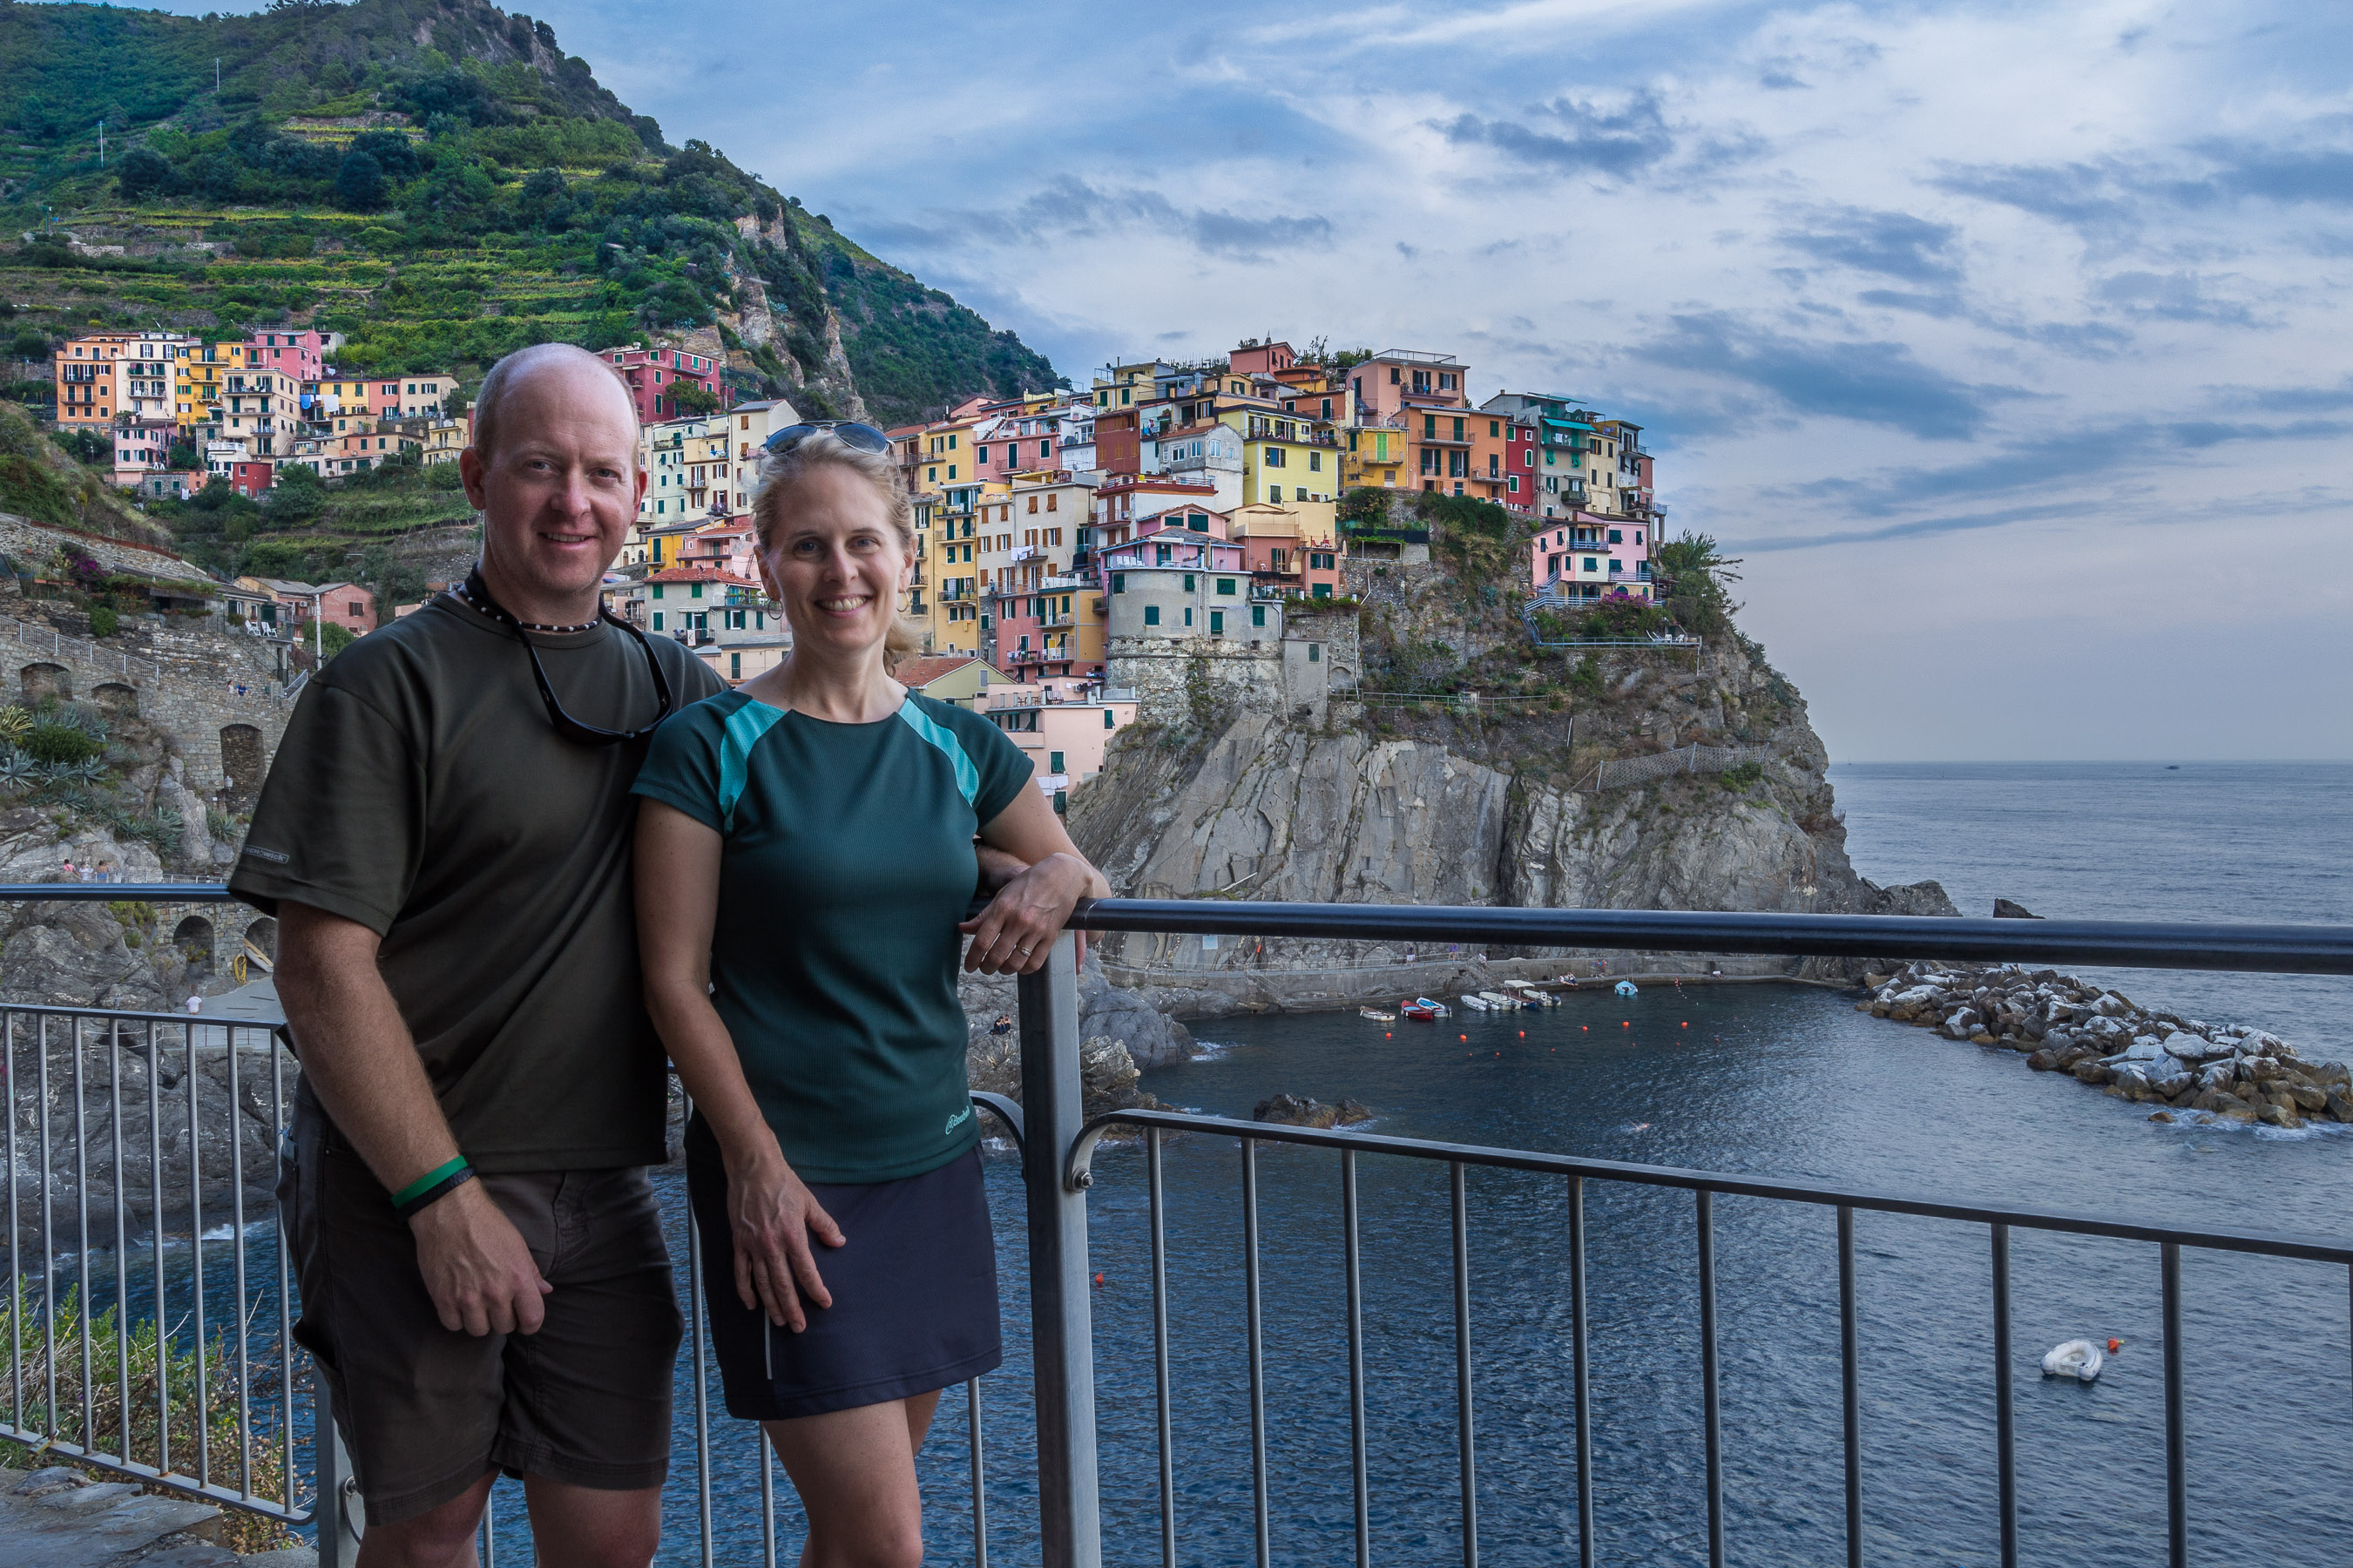 Culture, Denise, Europe, Florence, Italy, Me, Travel, Tuscany